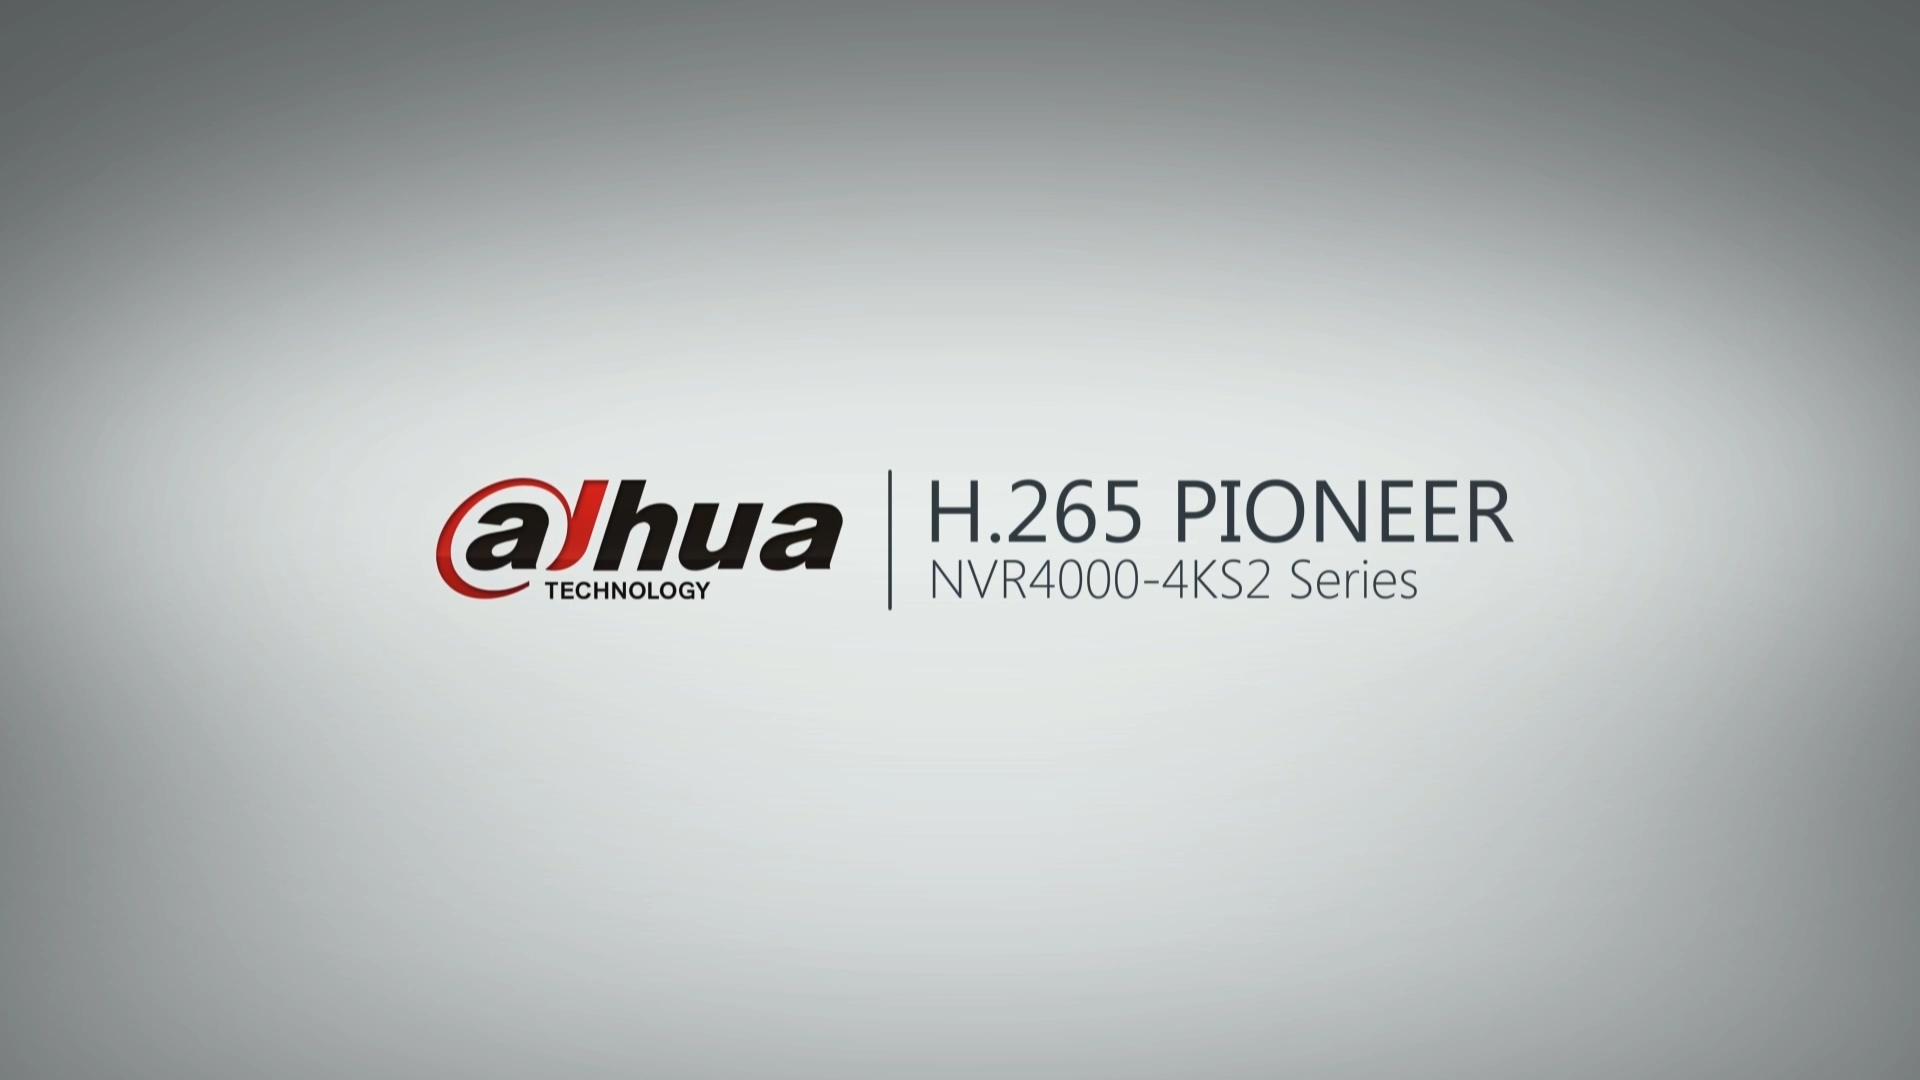 NVR4000-4KS2.H.265